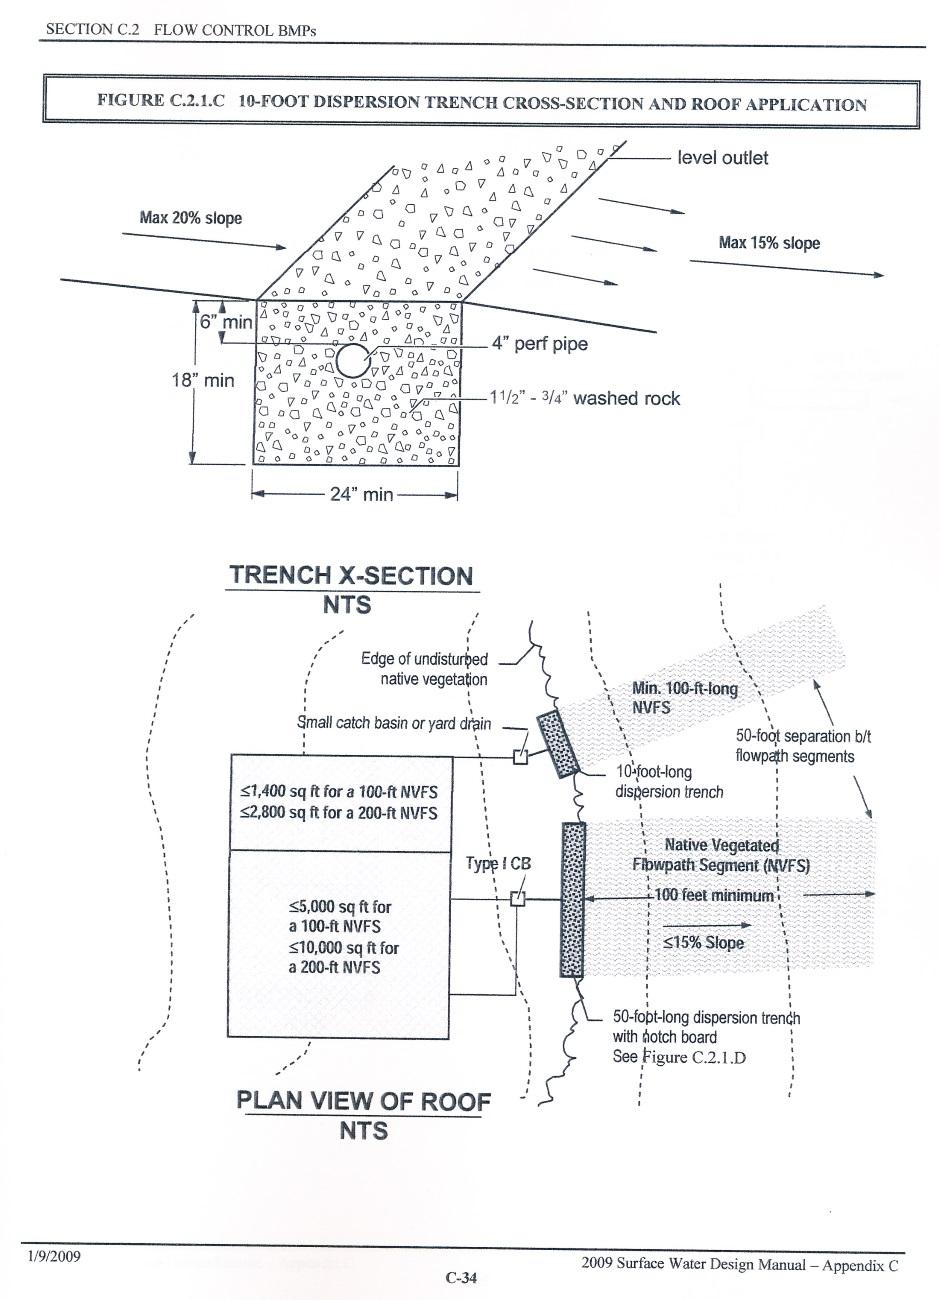 Trench drain detail - Drainage Plan